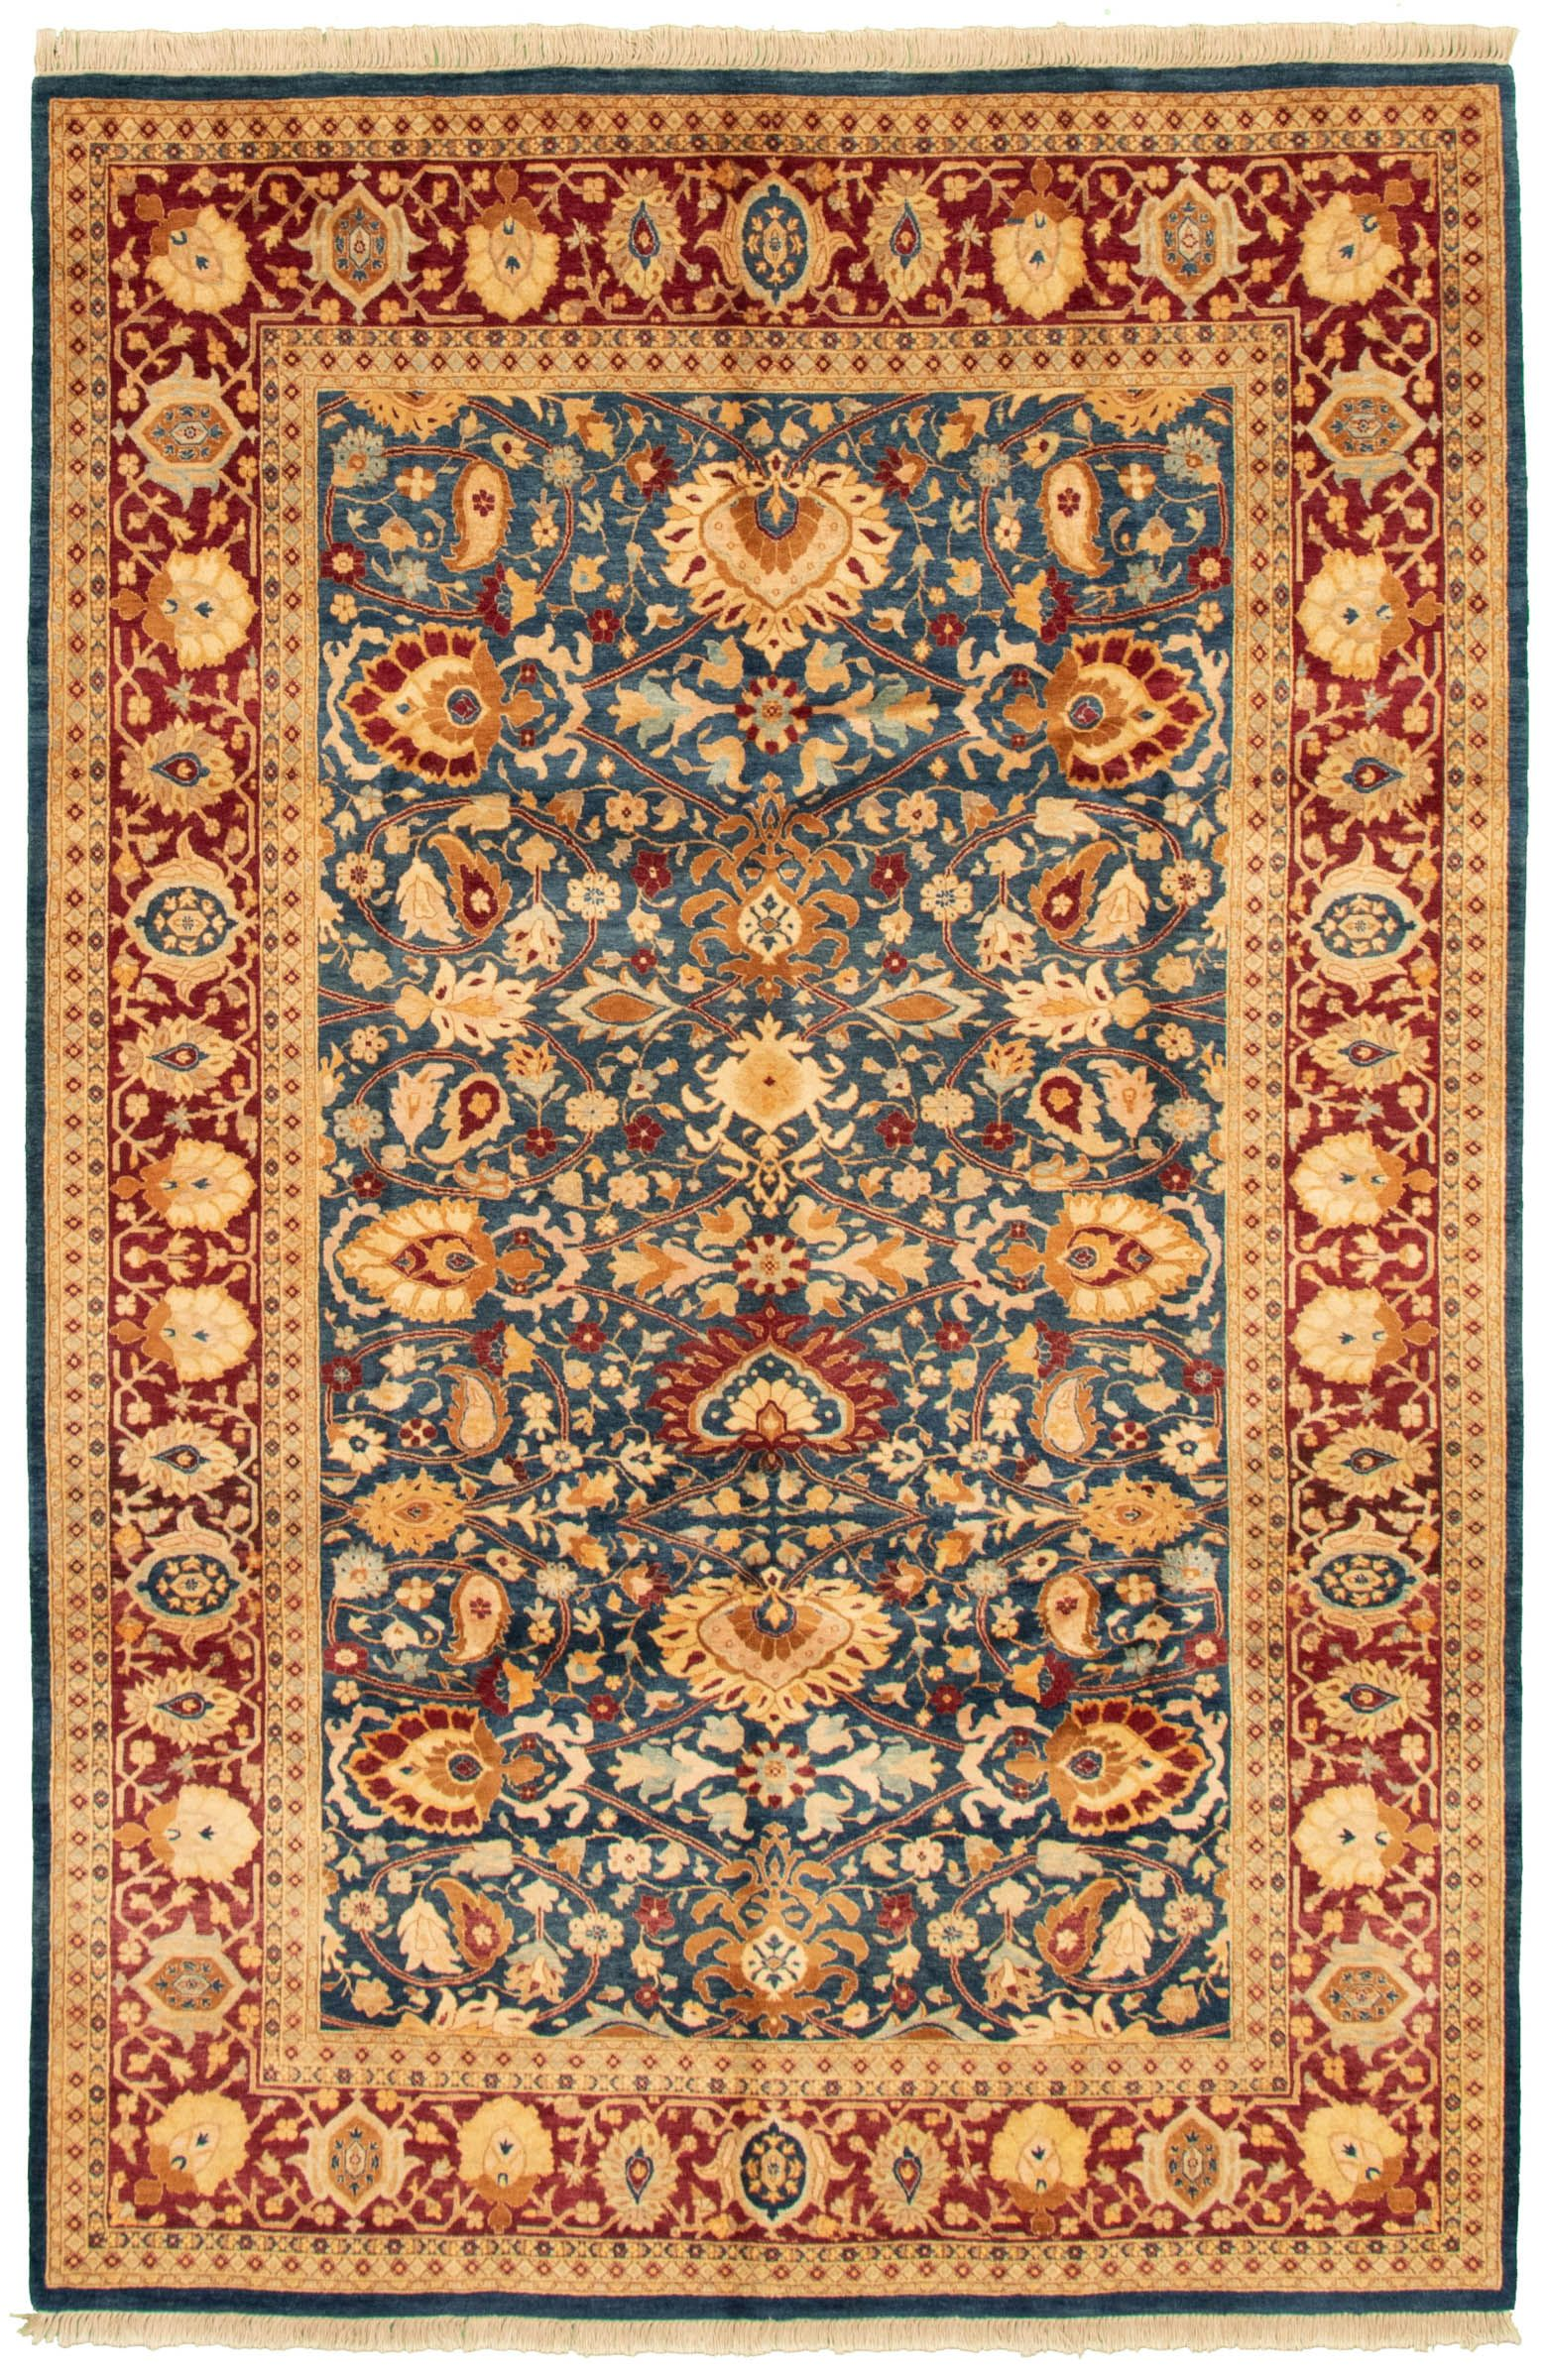 Pakistani Pako Persian 18 20 6 0 X 9 1 Hand Knotted Wool Dark Blue Rug Ecarpetgallery